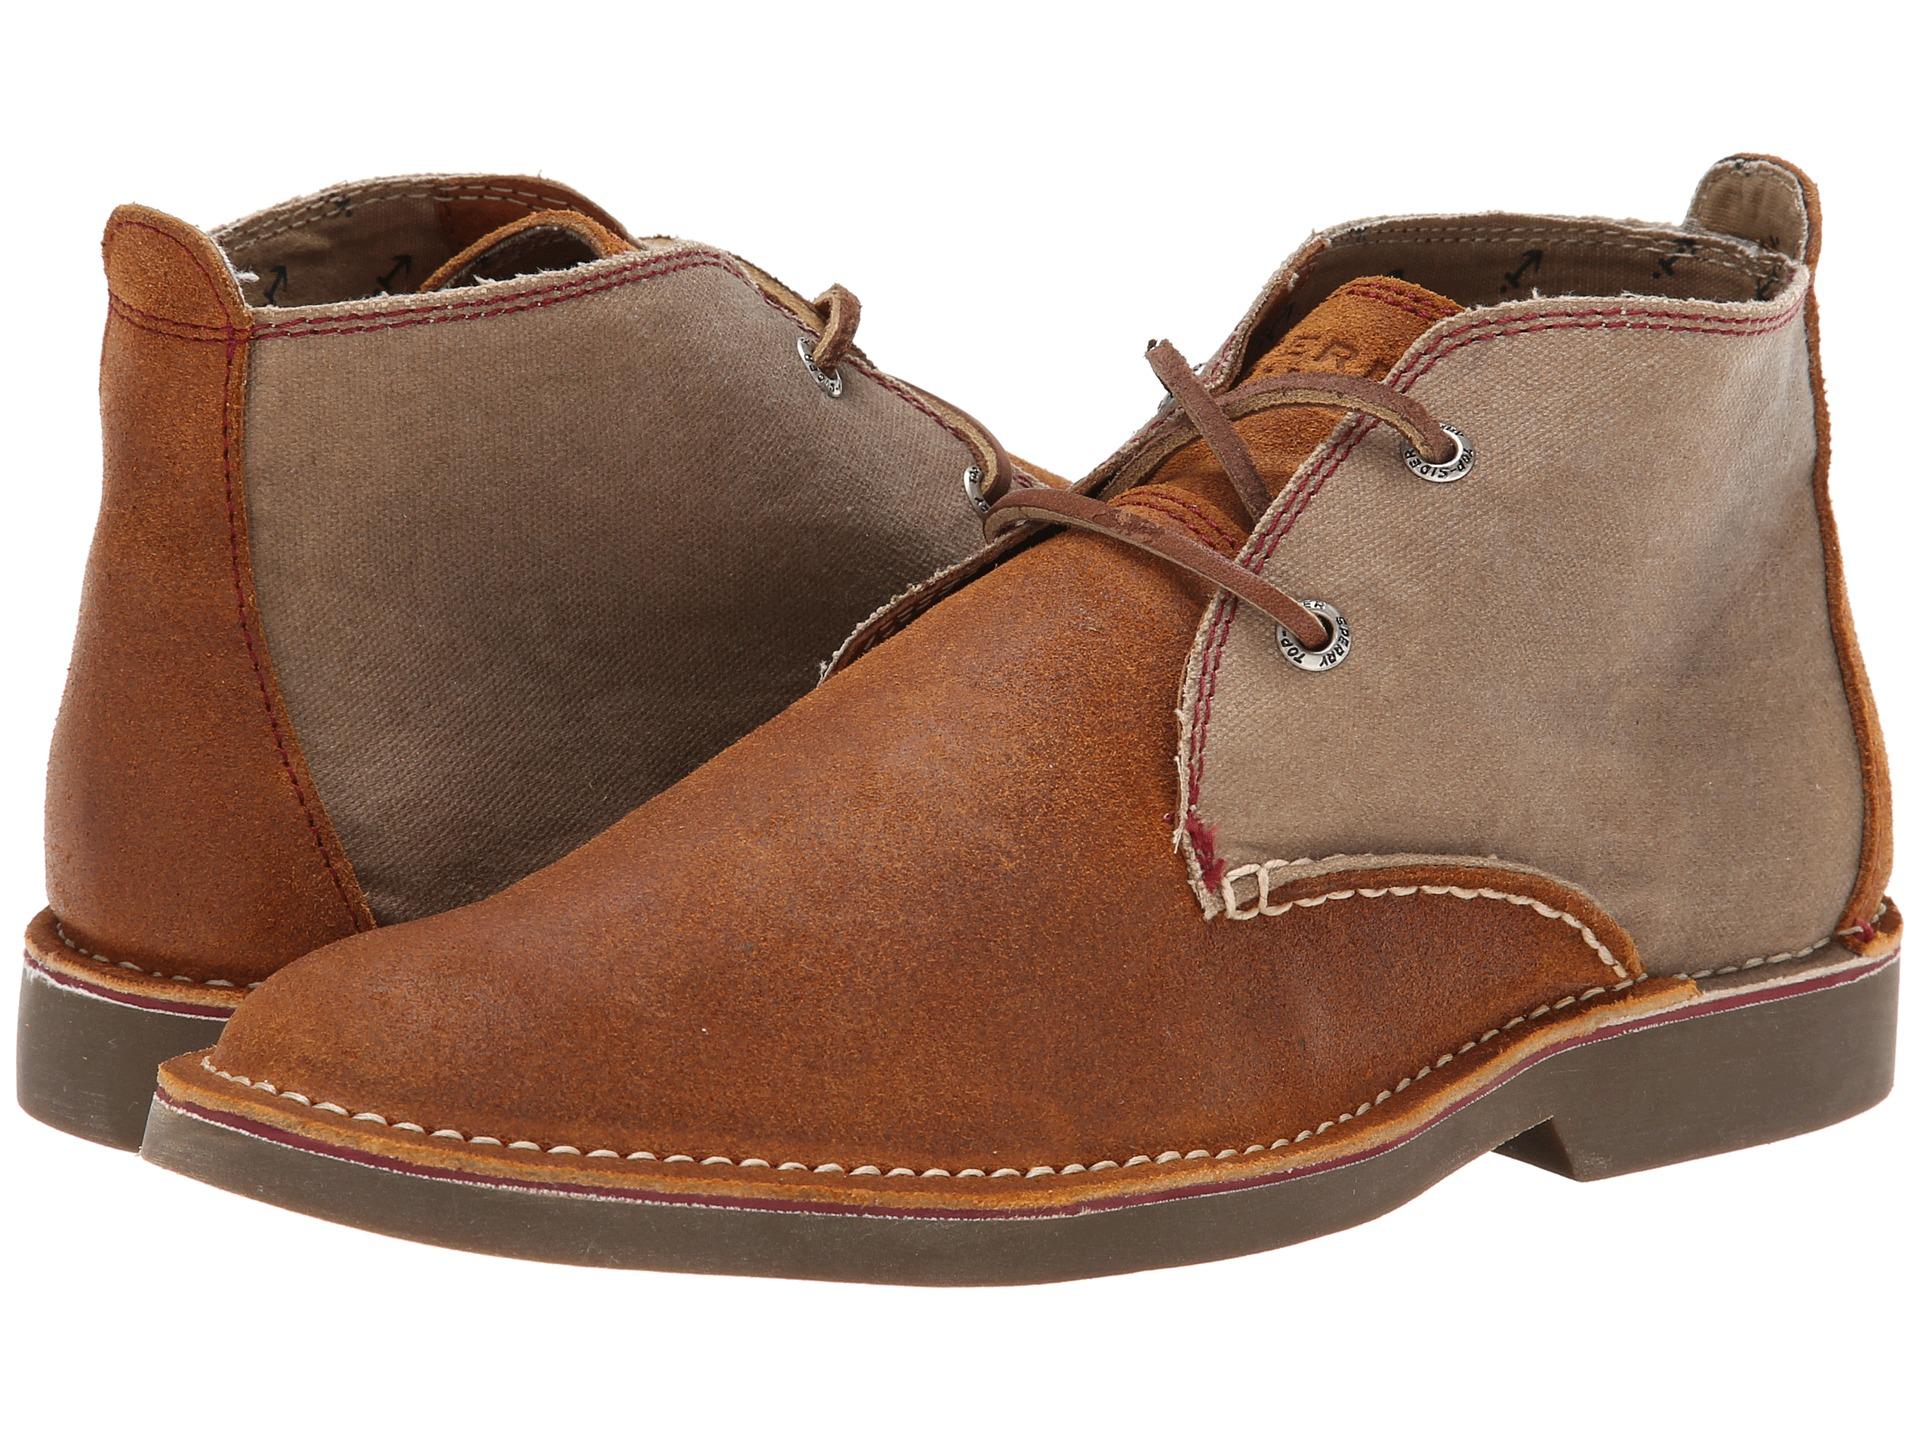 Cool Sperry Menu00b4s Authentic Original Mini Lug Chukka Boots | Dillards